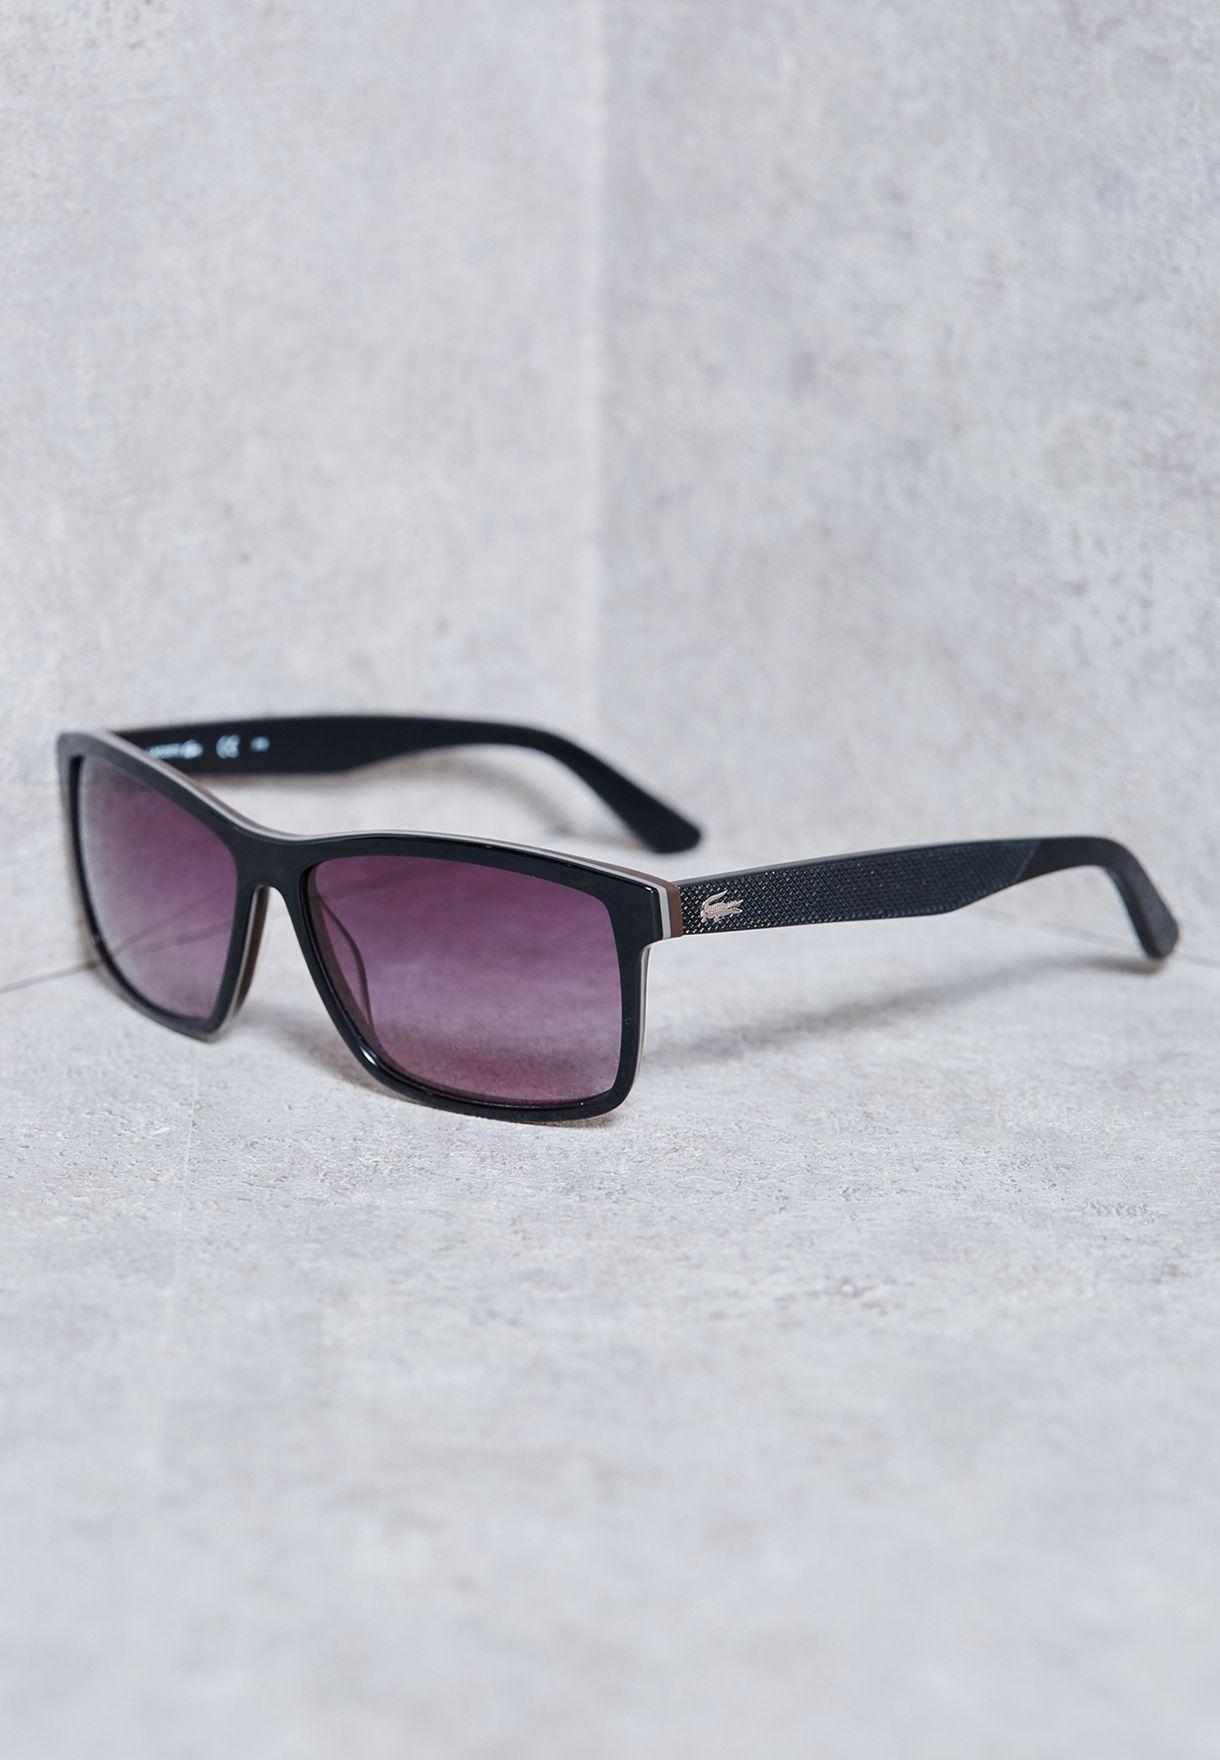 e82a46054 تسوق نظارة شمسية كلاسيكية ماركة لاكوست لون أسود L705S-001 في البحرين ...